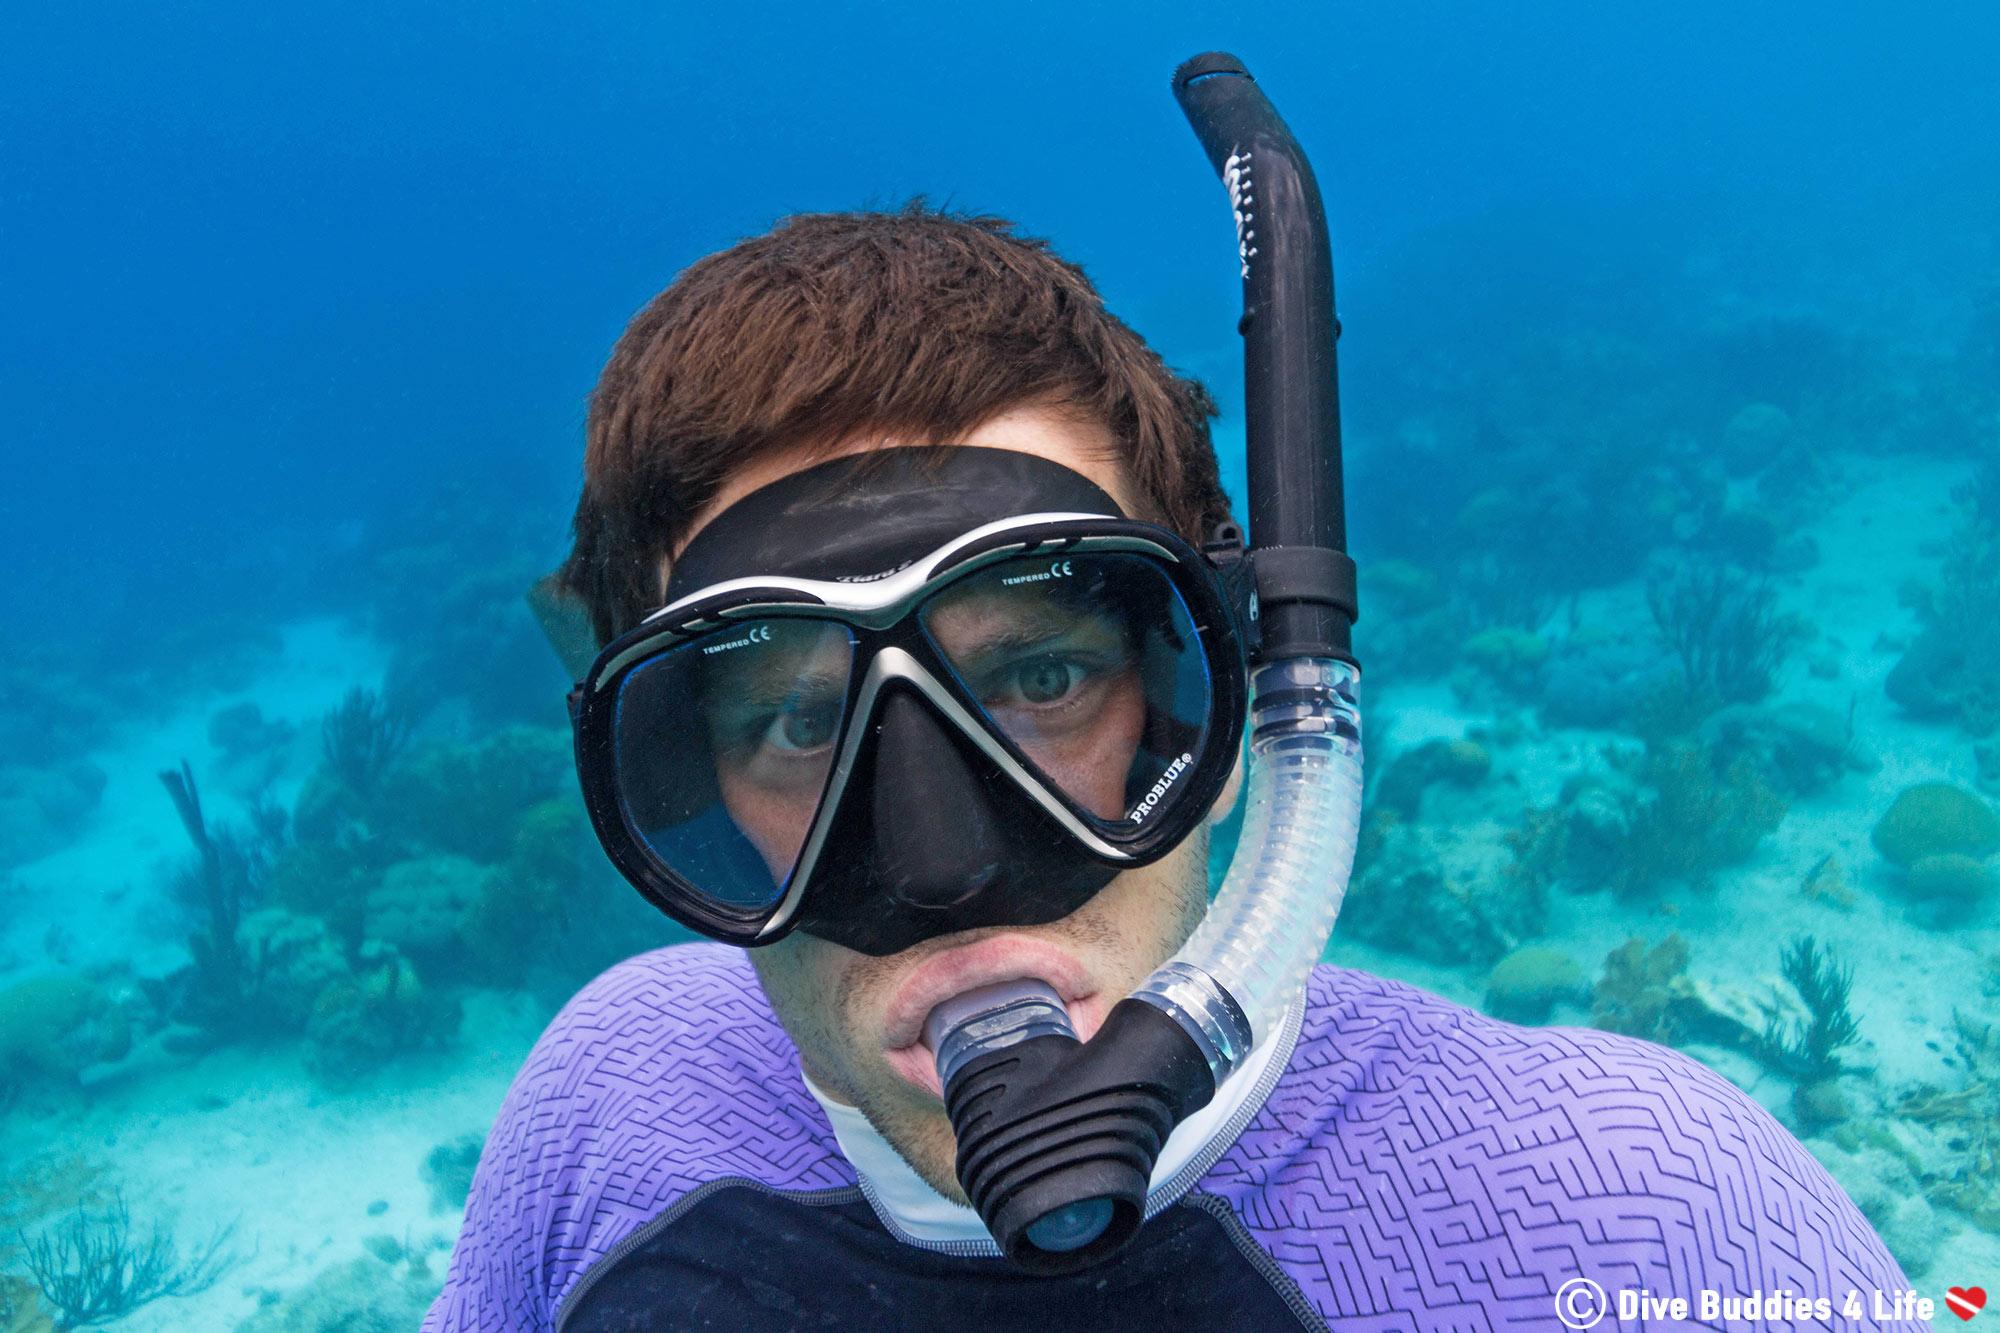 Snorkeling Joey In The Clear Water Of Bonaire, Dutch Caribbean